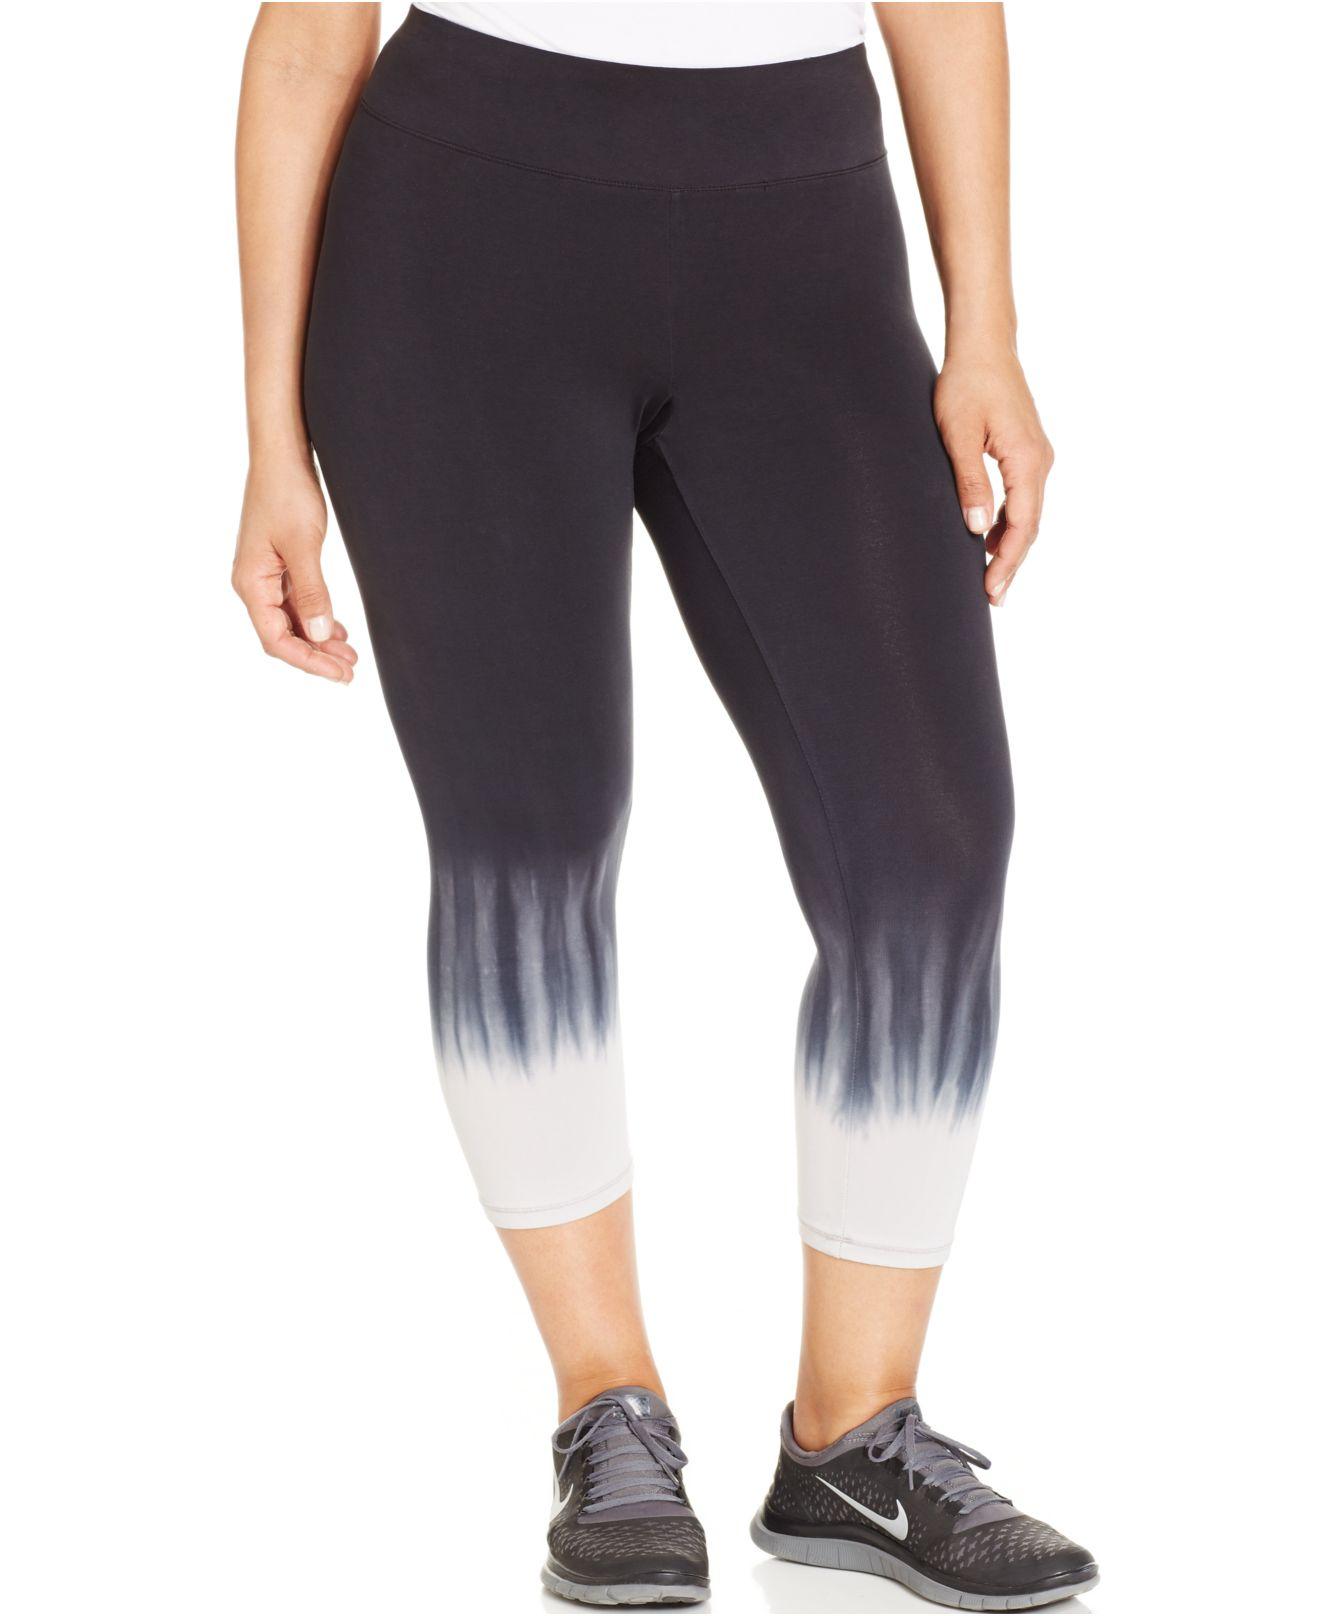 98bcb78dee6 Lyst - Calvin Klein Performance Plus Size Ombré Capri Leggings in Black